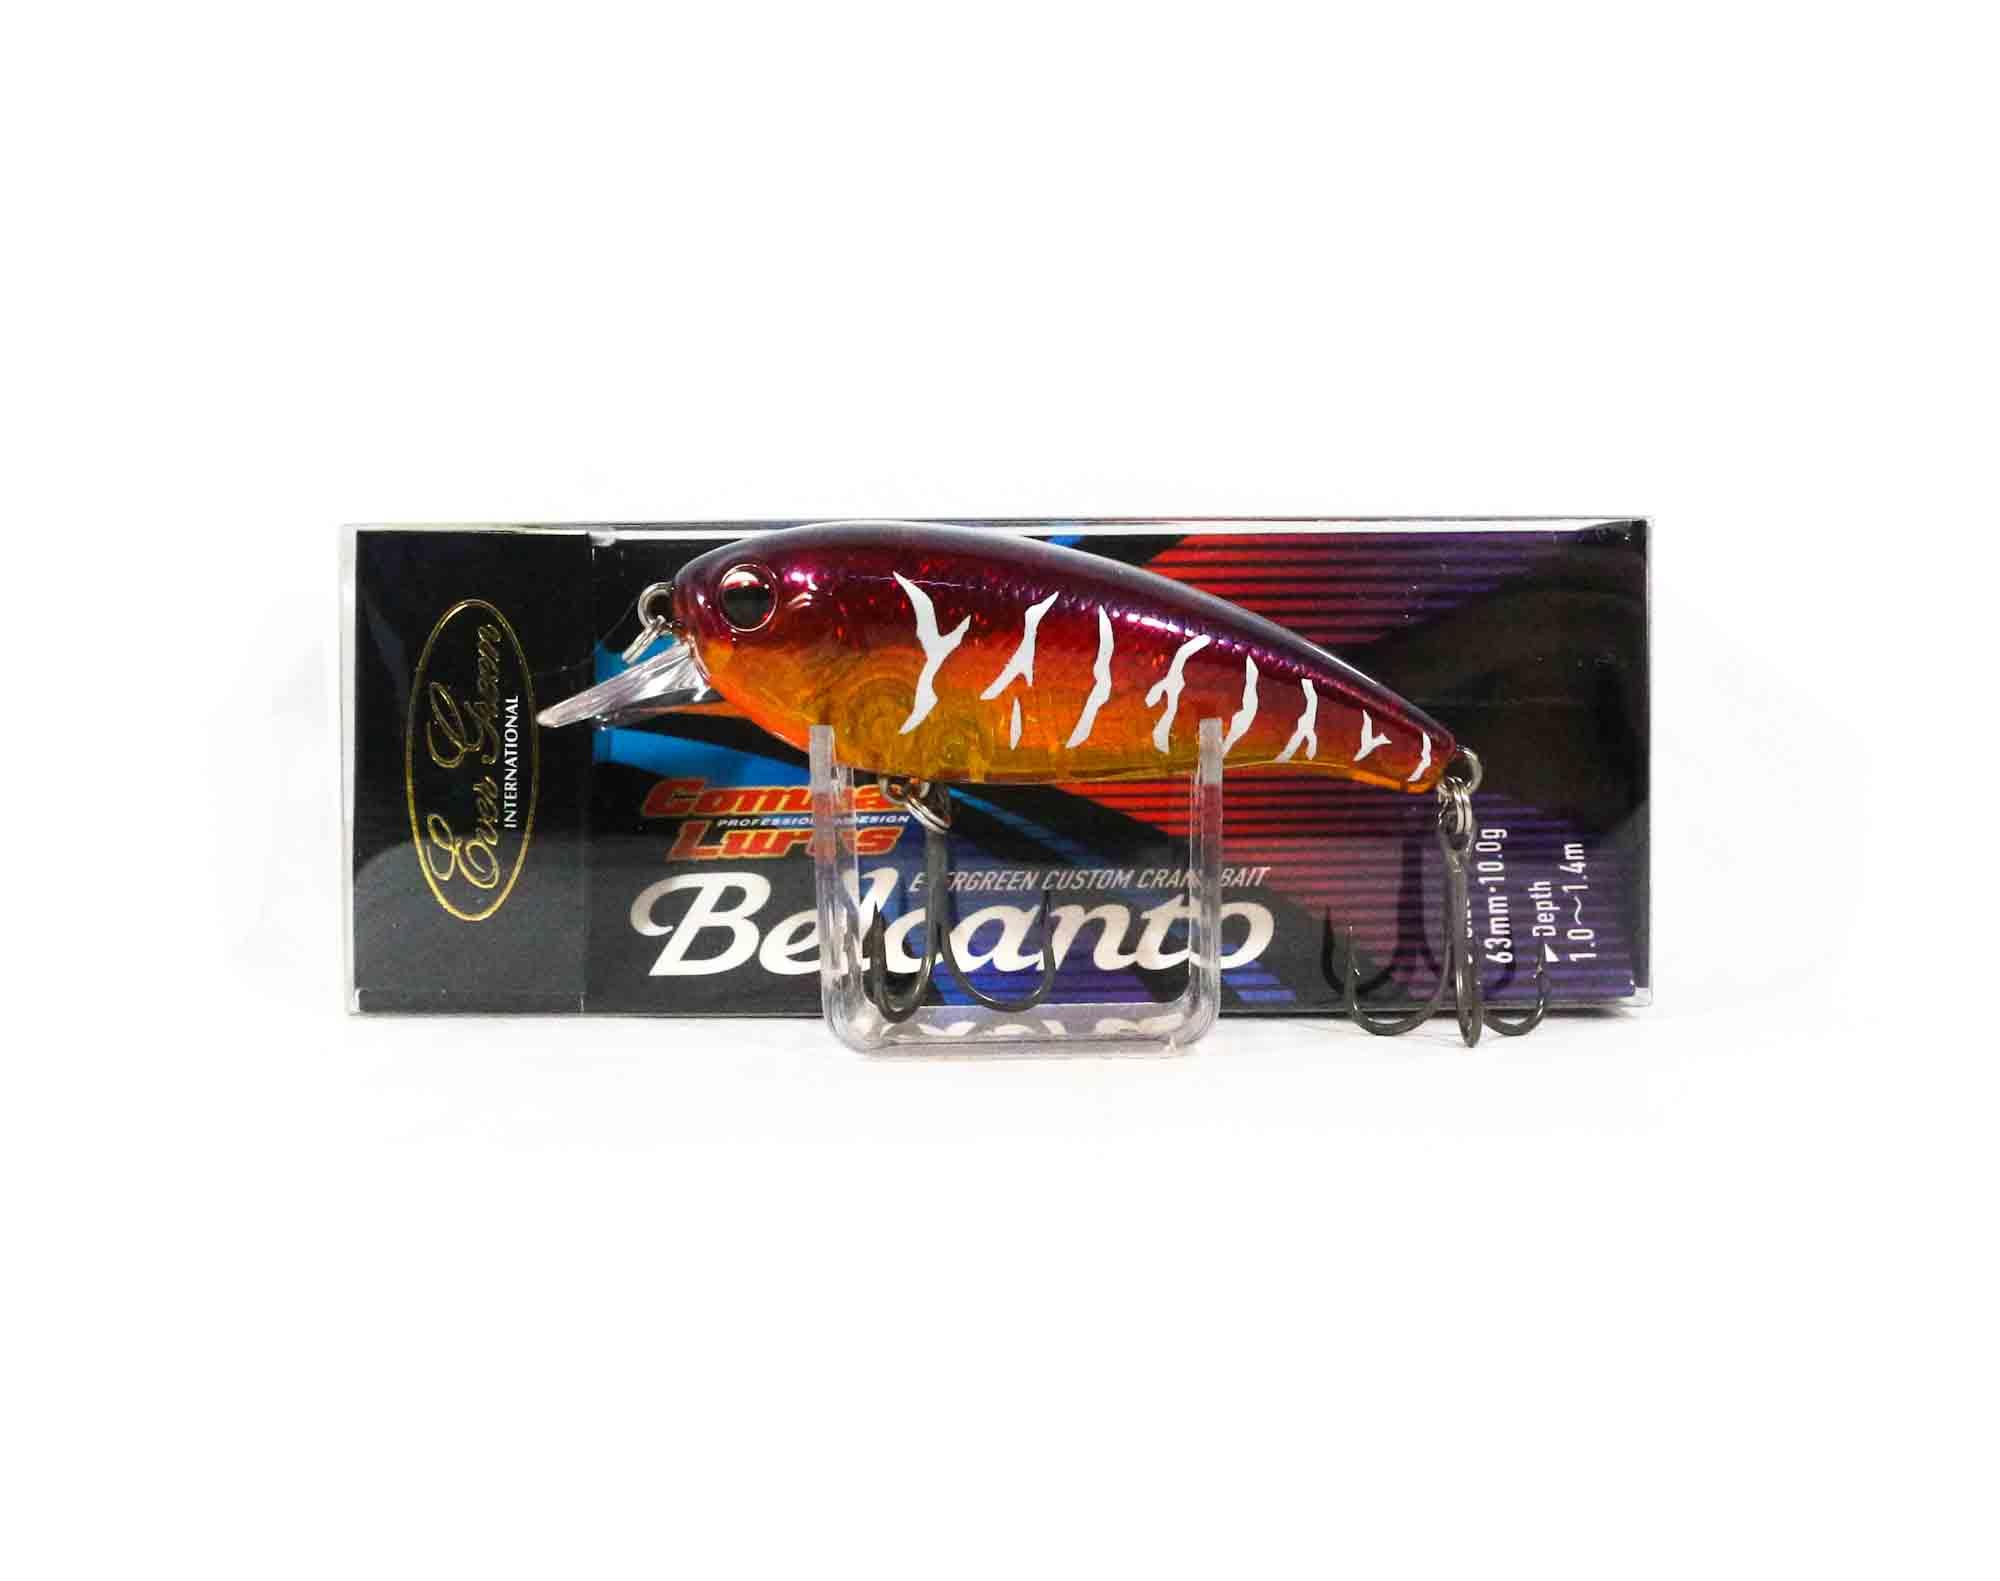 Evergreen Belcanto 63 Floating Lure 19 (3756)